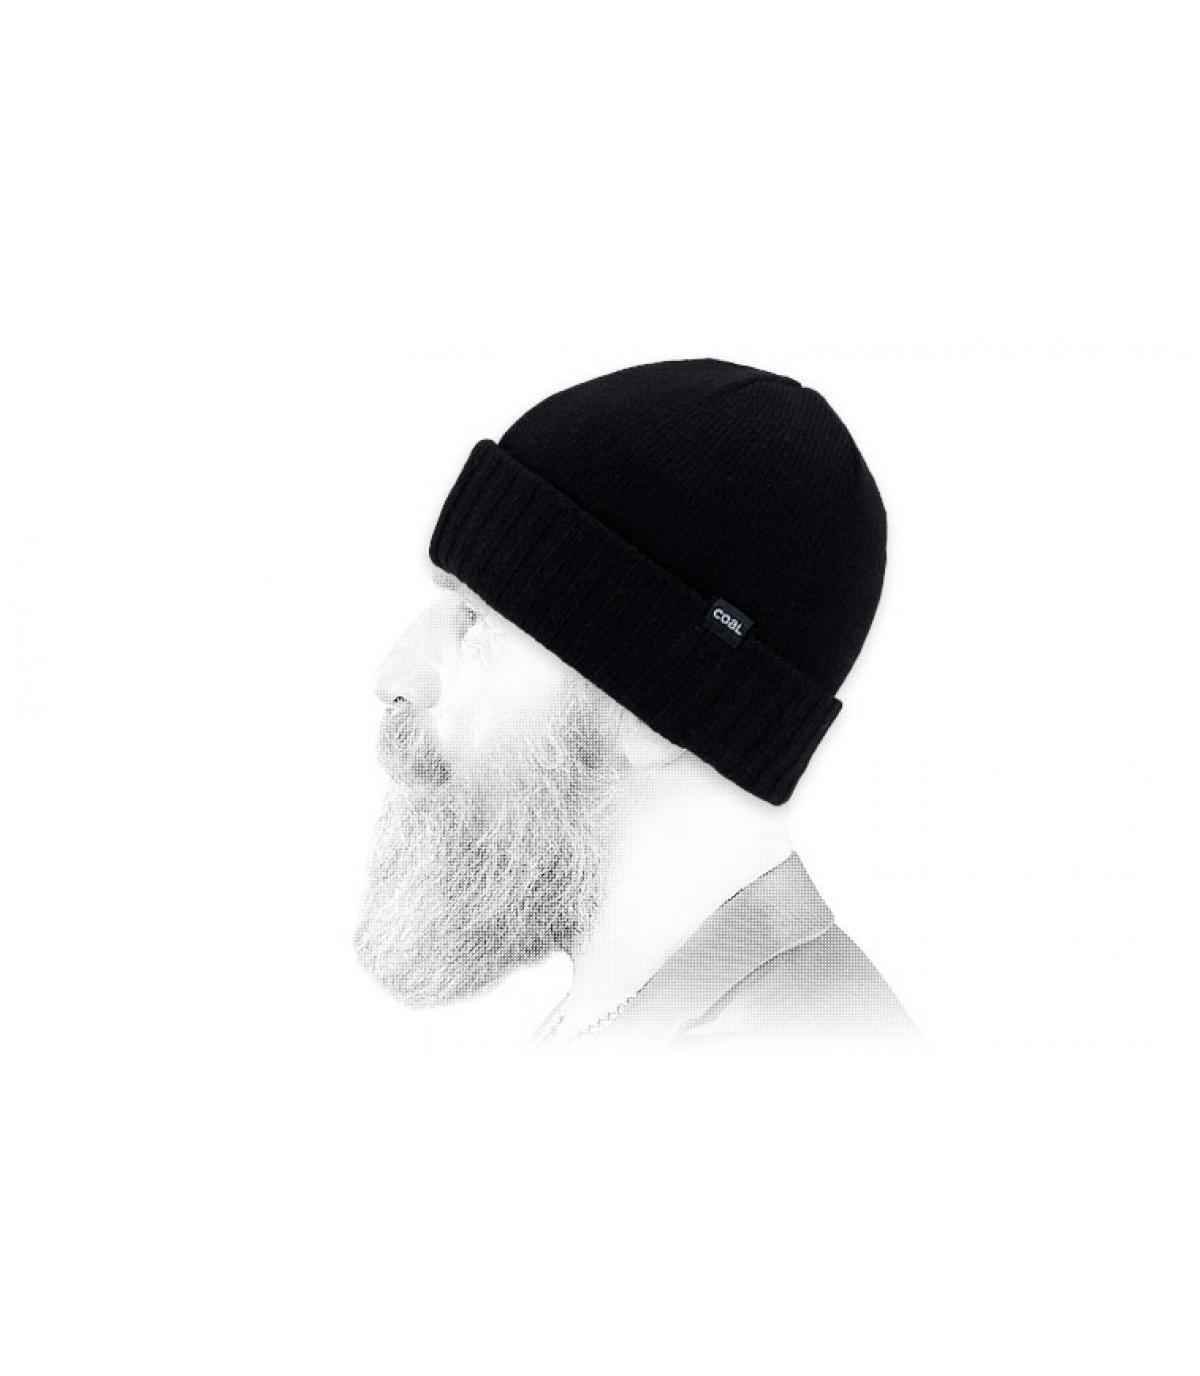 Mütze Wolle schwarz Coal